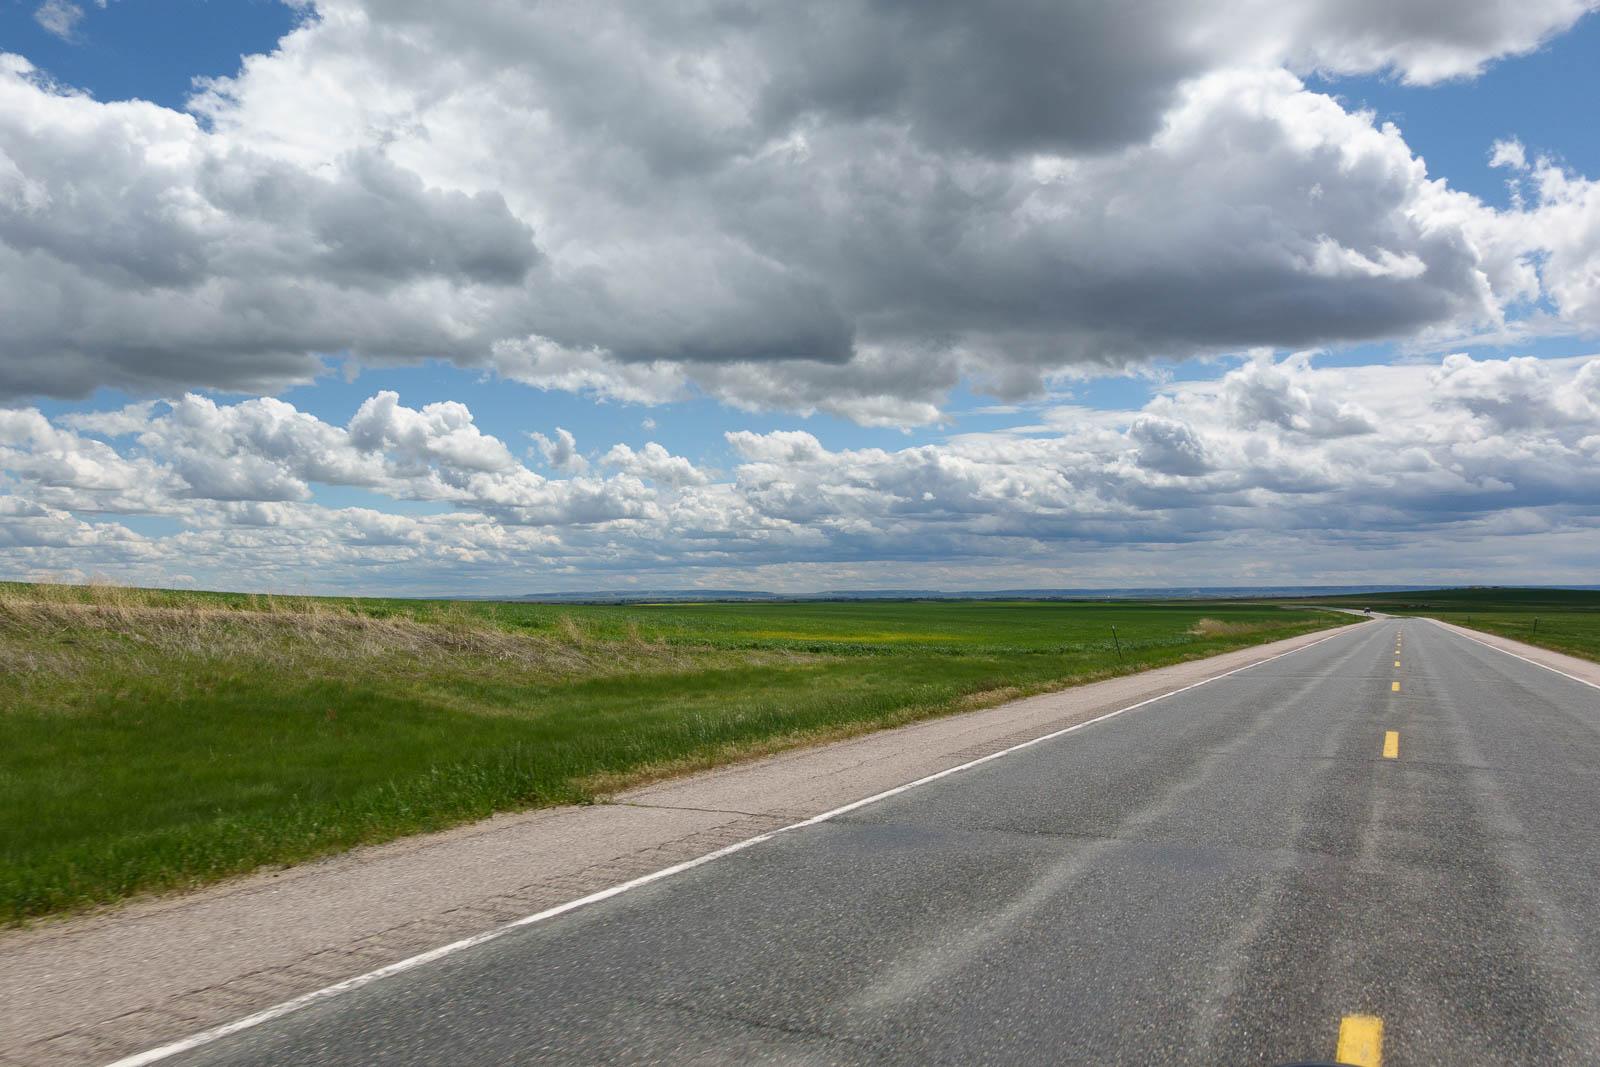 Mini crew car road-trip in Torrington, WY